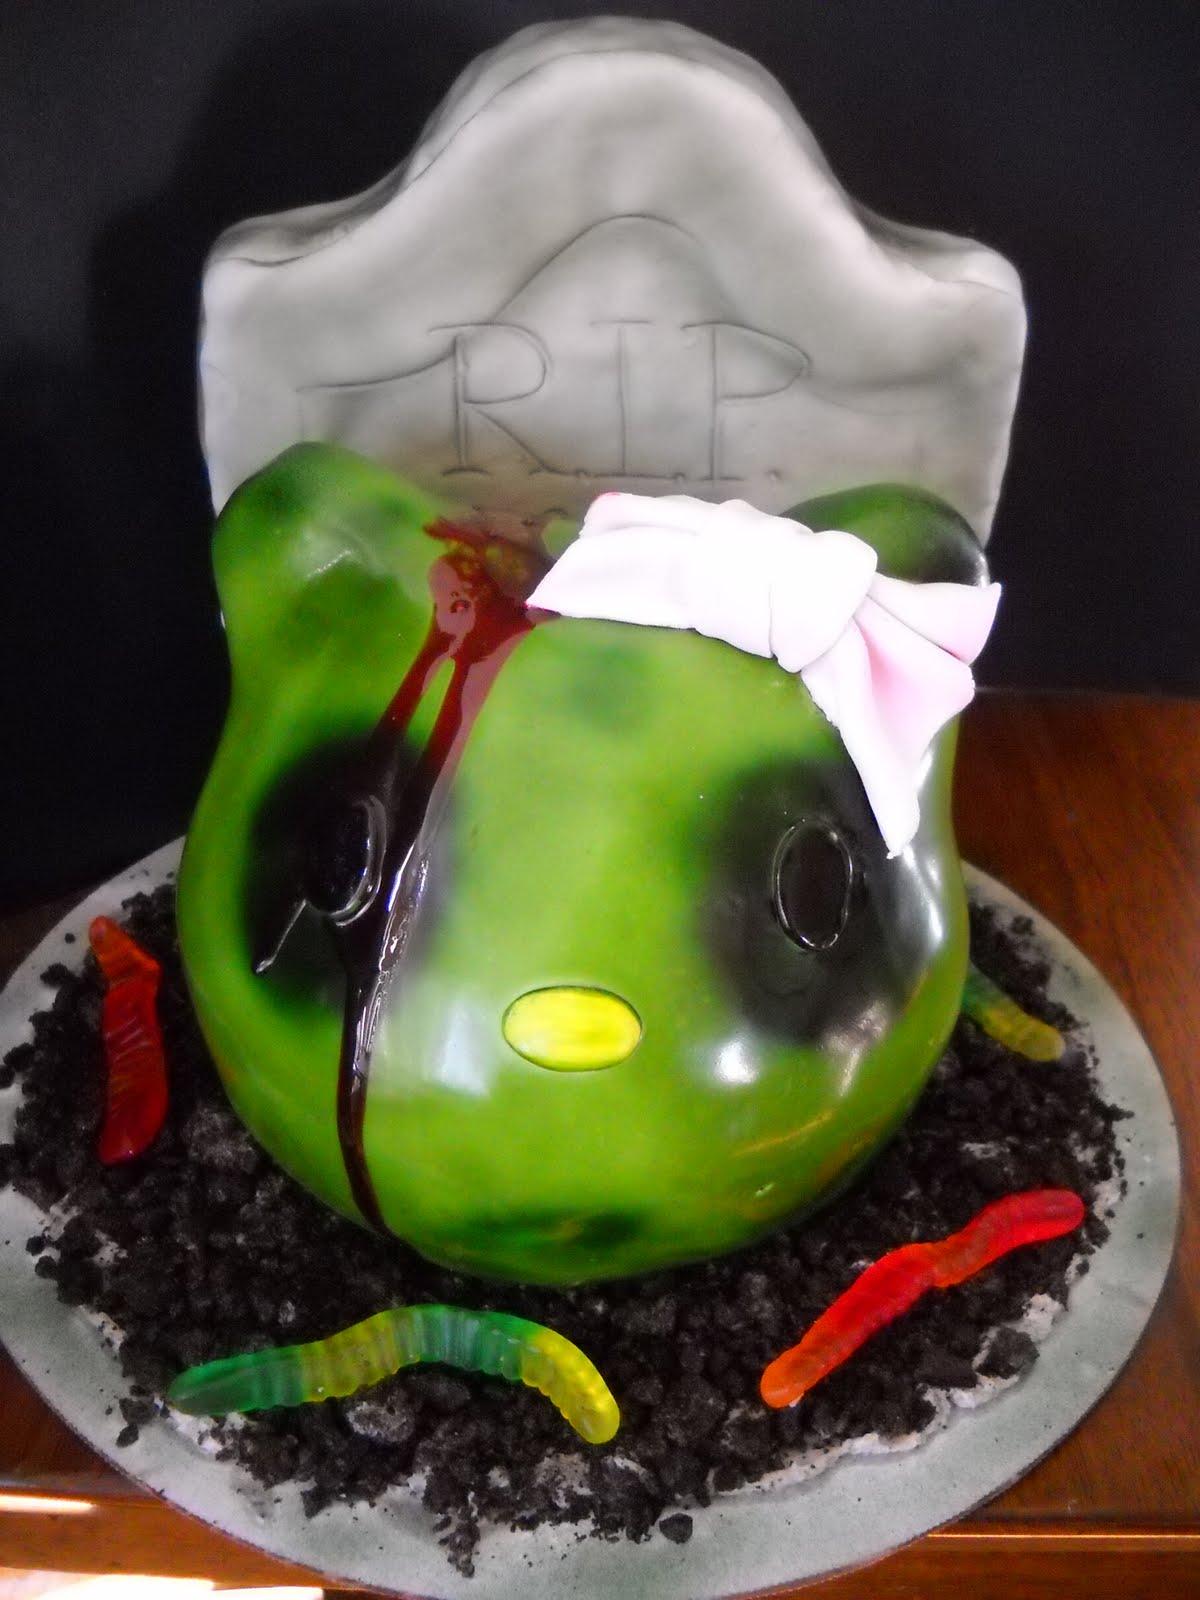 Zombie Hello Kitty Cake Tara's Piece of Cake: ...